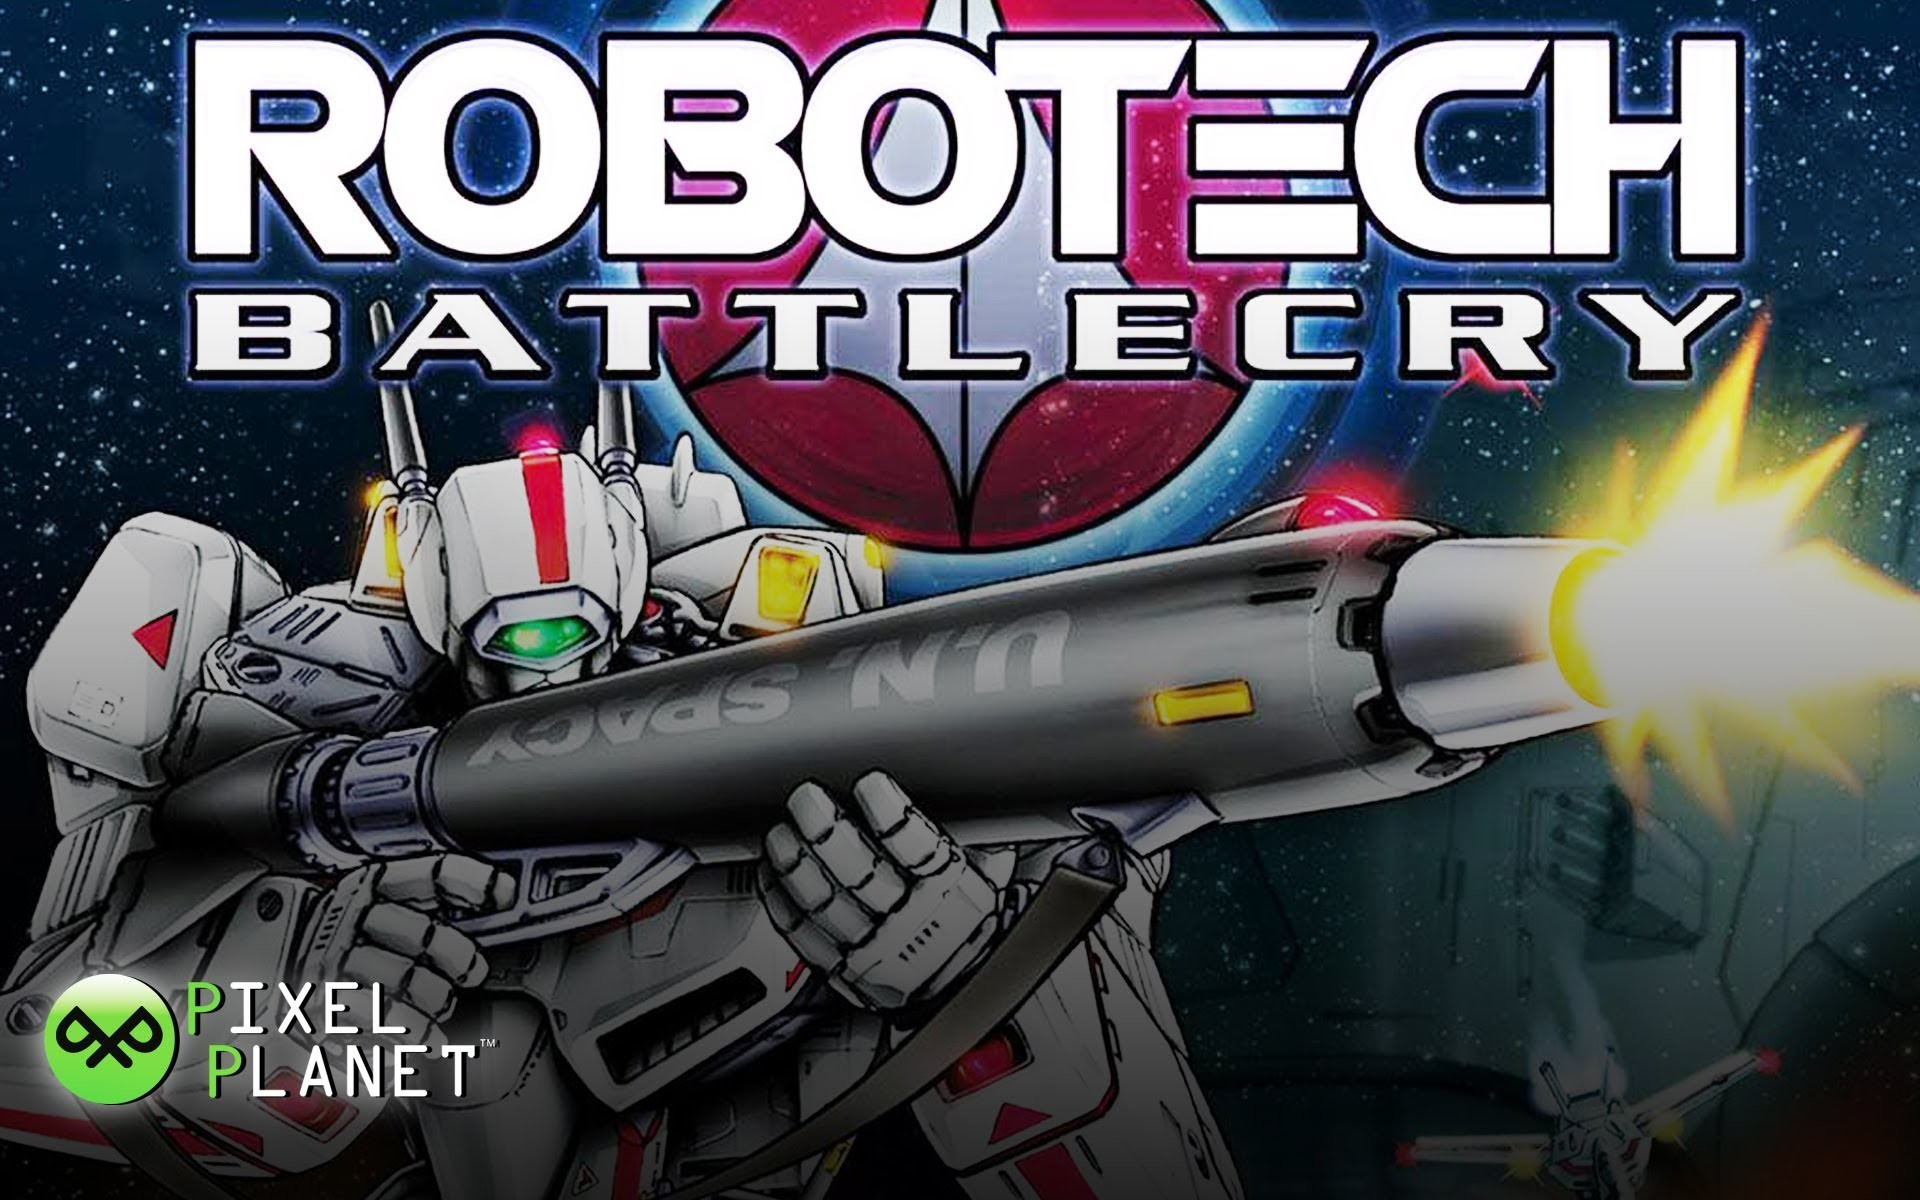 Robotech Battlecry – intro HD (2007) Old Skool!